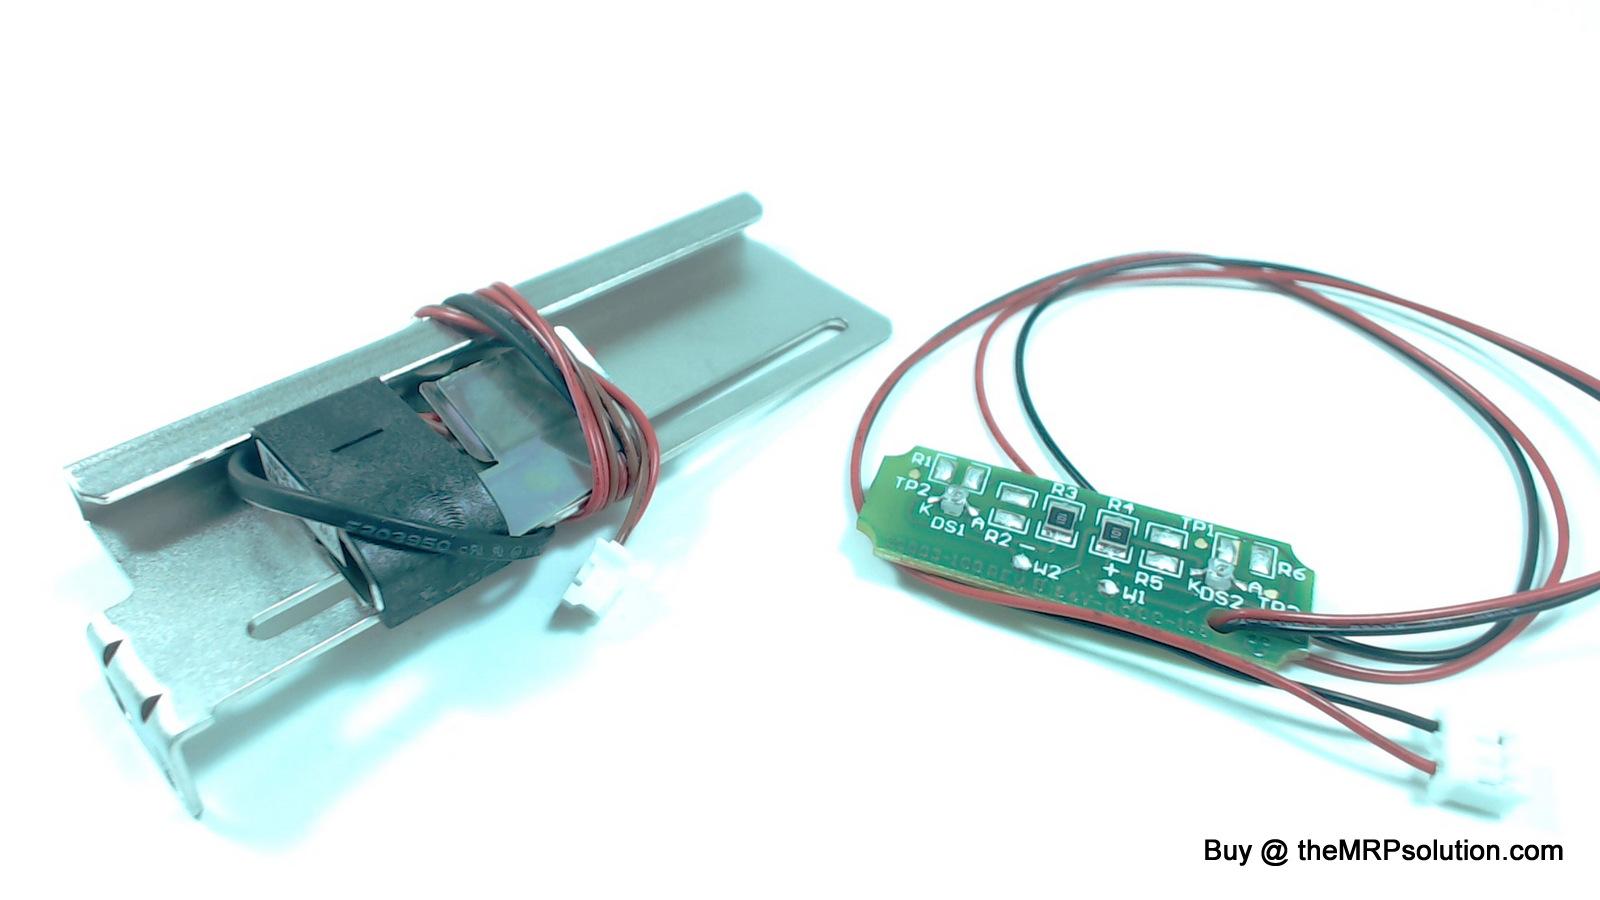 ZEBRA 46302-4M UPPER and LOWER MEDIA SENSOR Refurbished